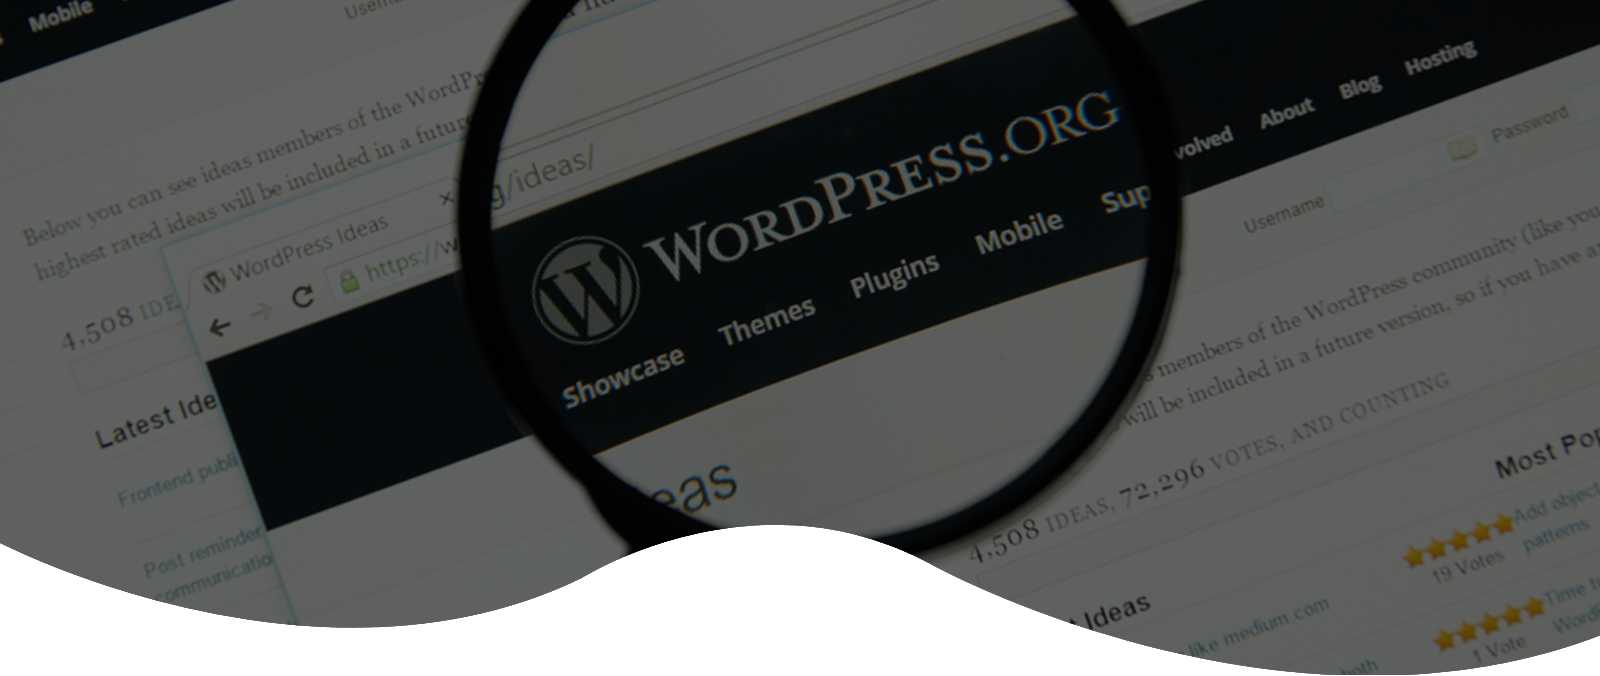 wordpress-website-development-services-by-digics-pvt-ltd